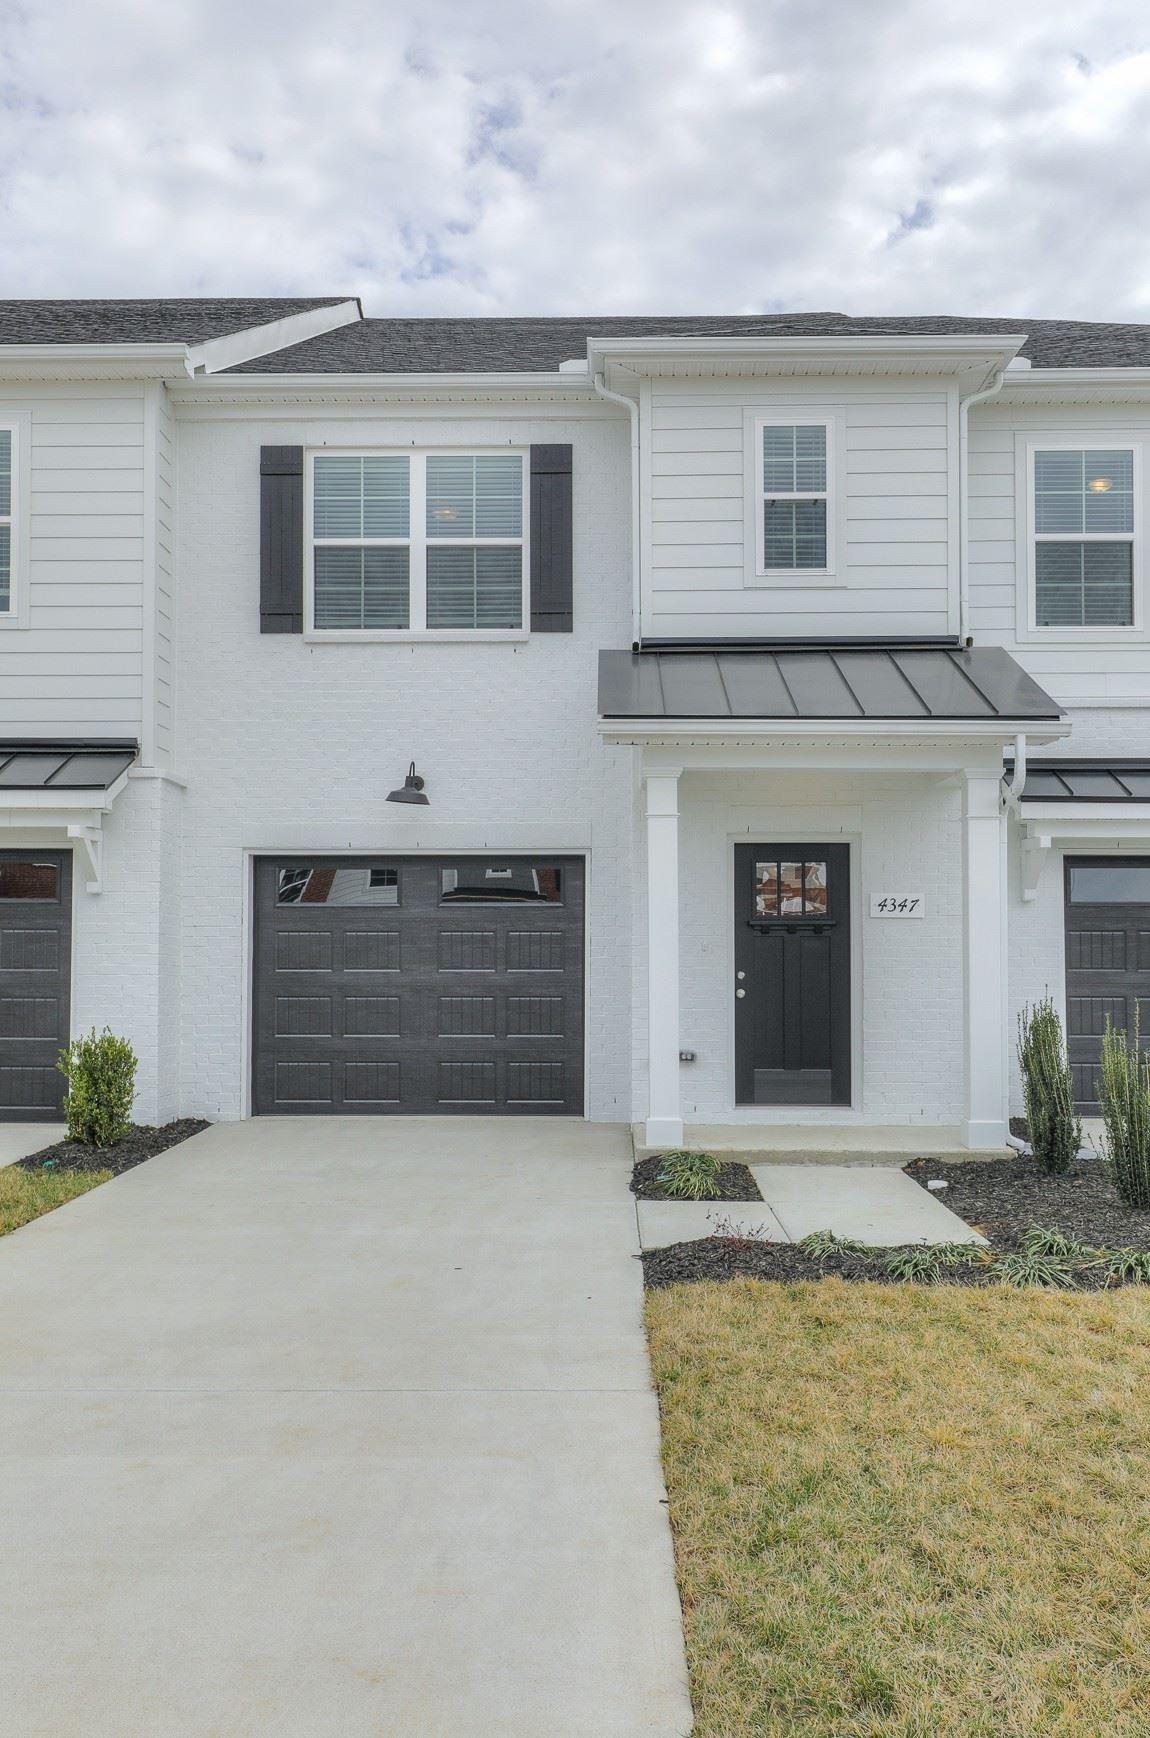 Photo of 4210 Spyglass Drive, Murfreesboro, TN 37127 (MLS # 2252088)